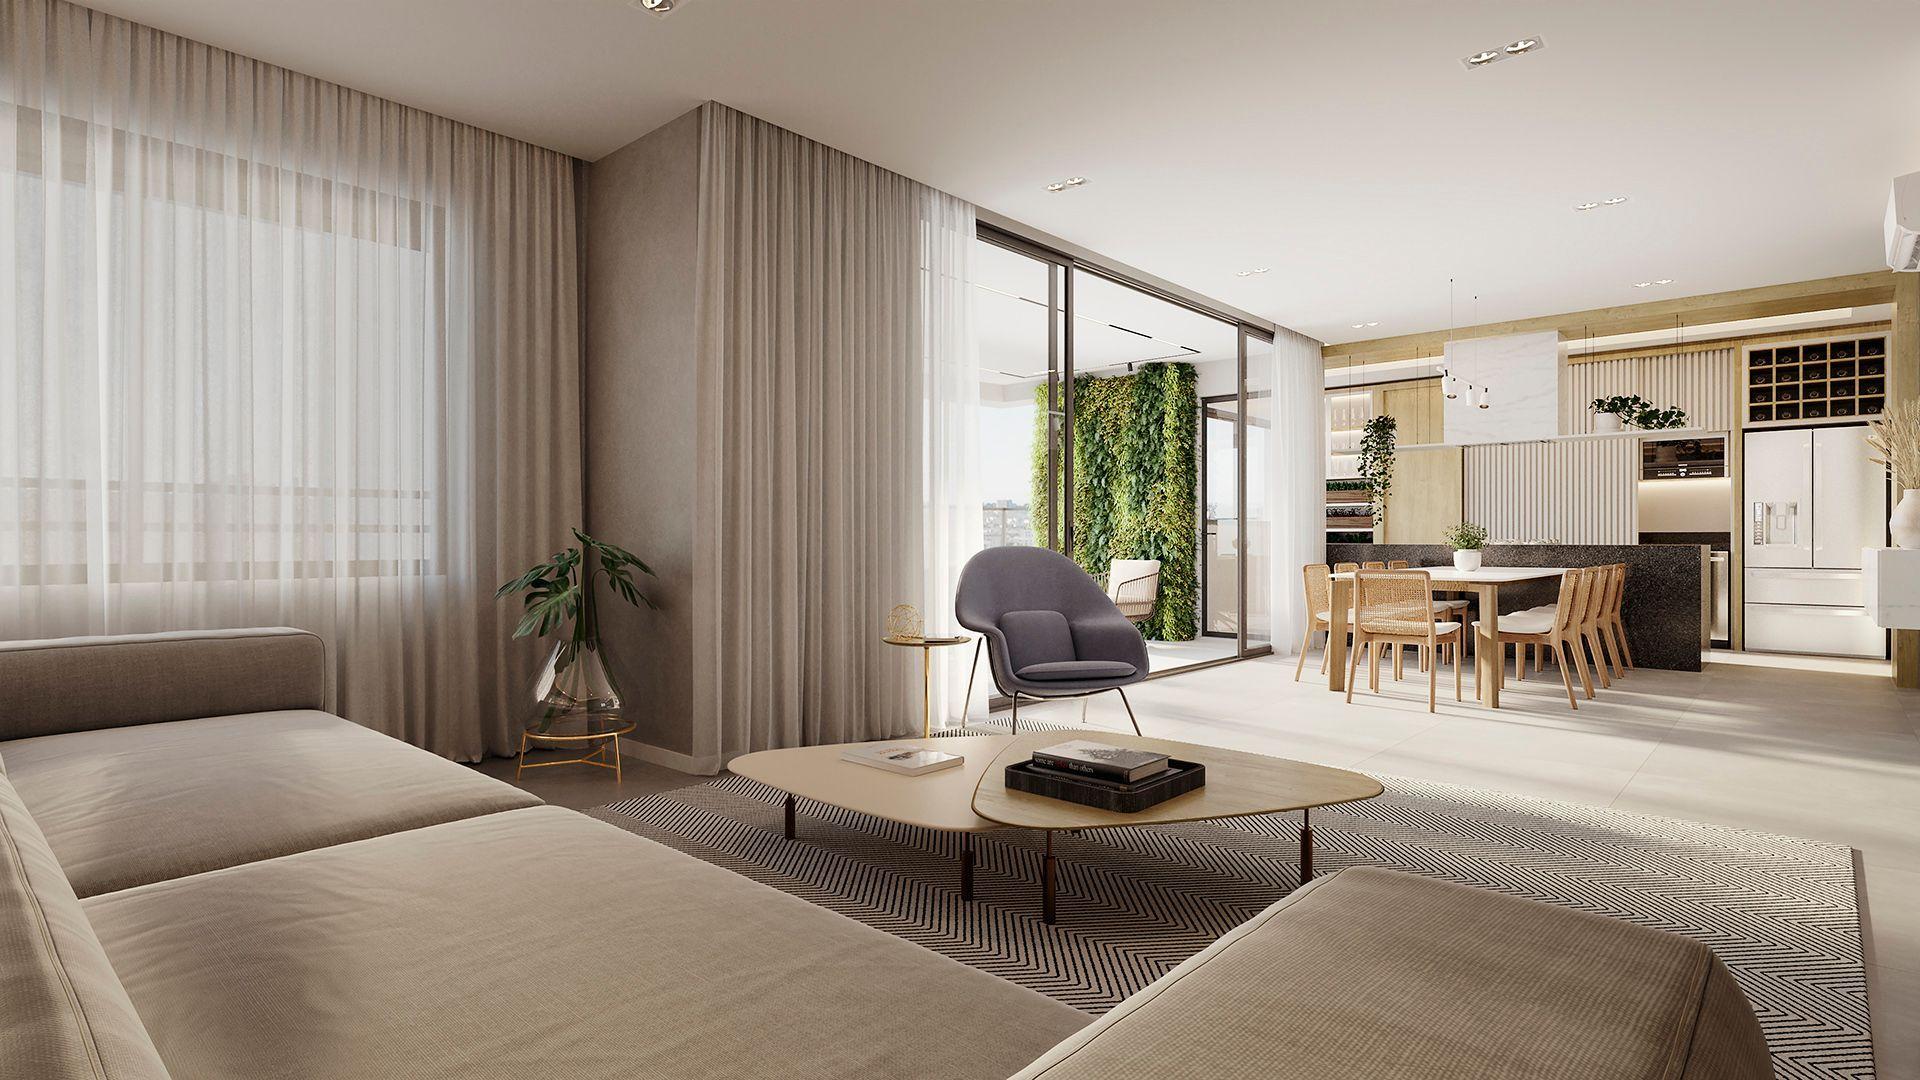 Apartamento à venda  no Jardim Karaíba - Uberlândia, MG. Imóveis